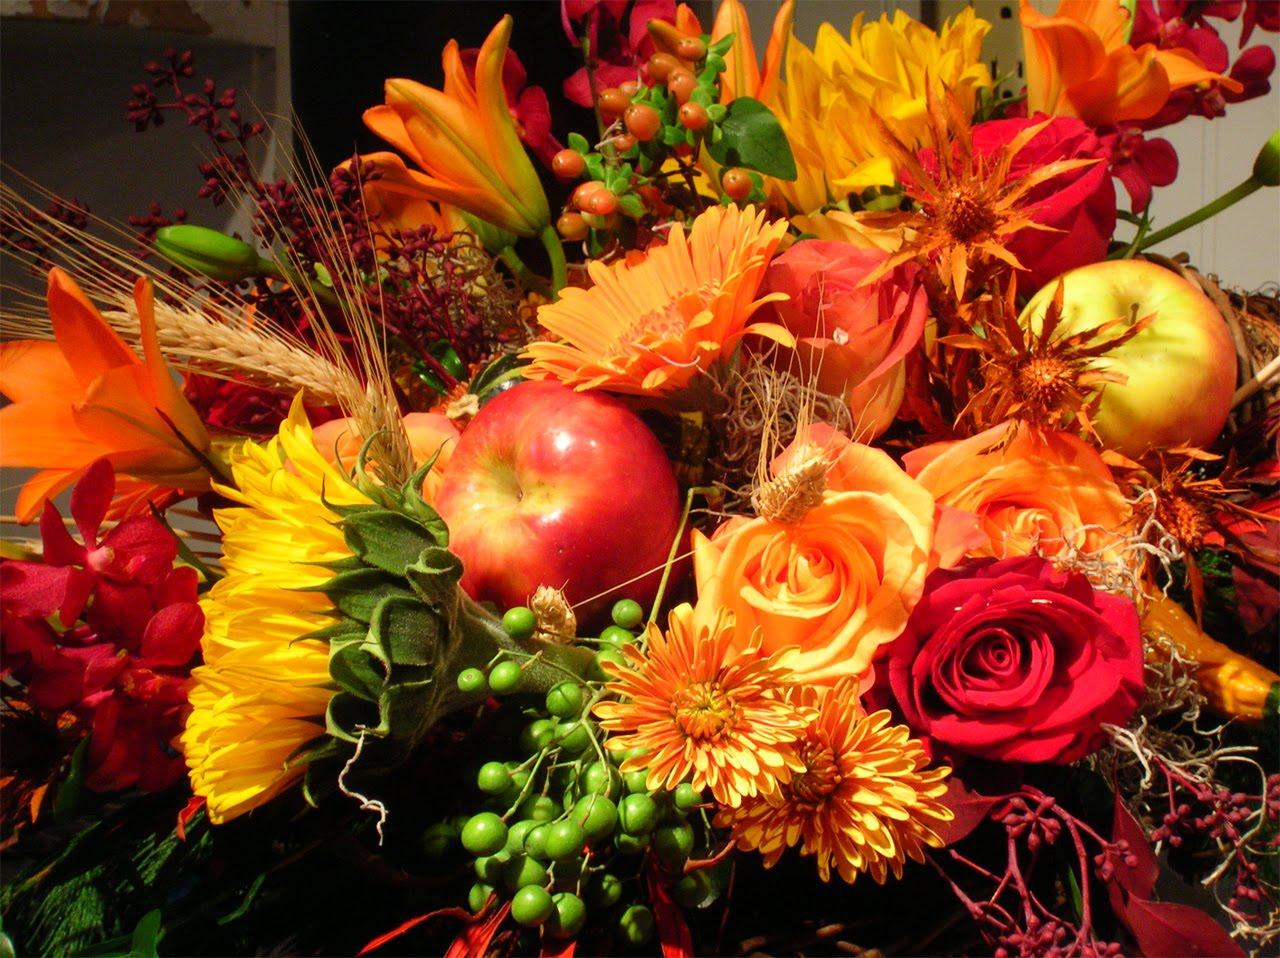 Thanksgiving Flower Wallpaper, Thanksgiving Sunflower Pictures